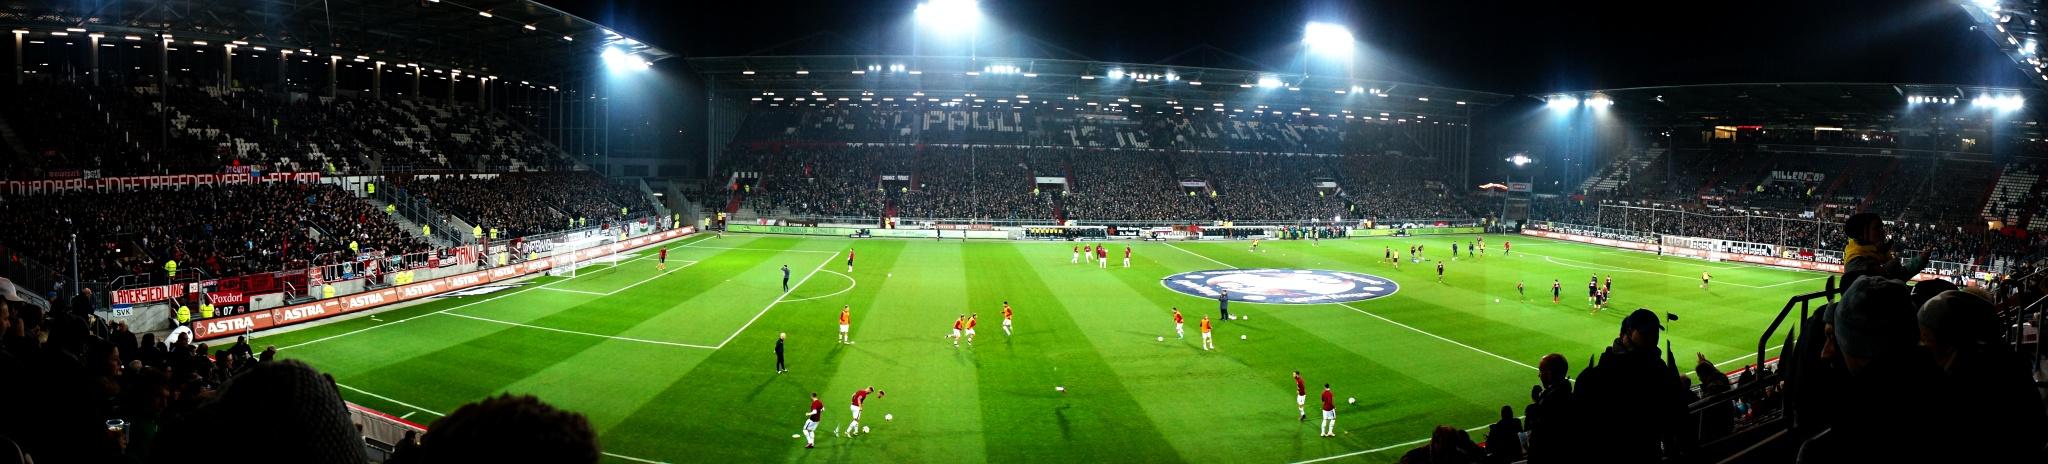 FC St. Pauli vs 1. FC Nürnberg oder:  par pari referre